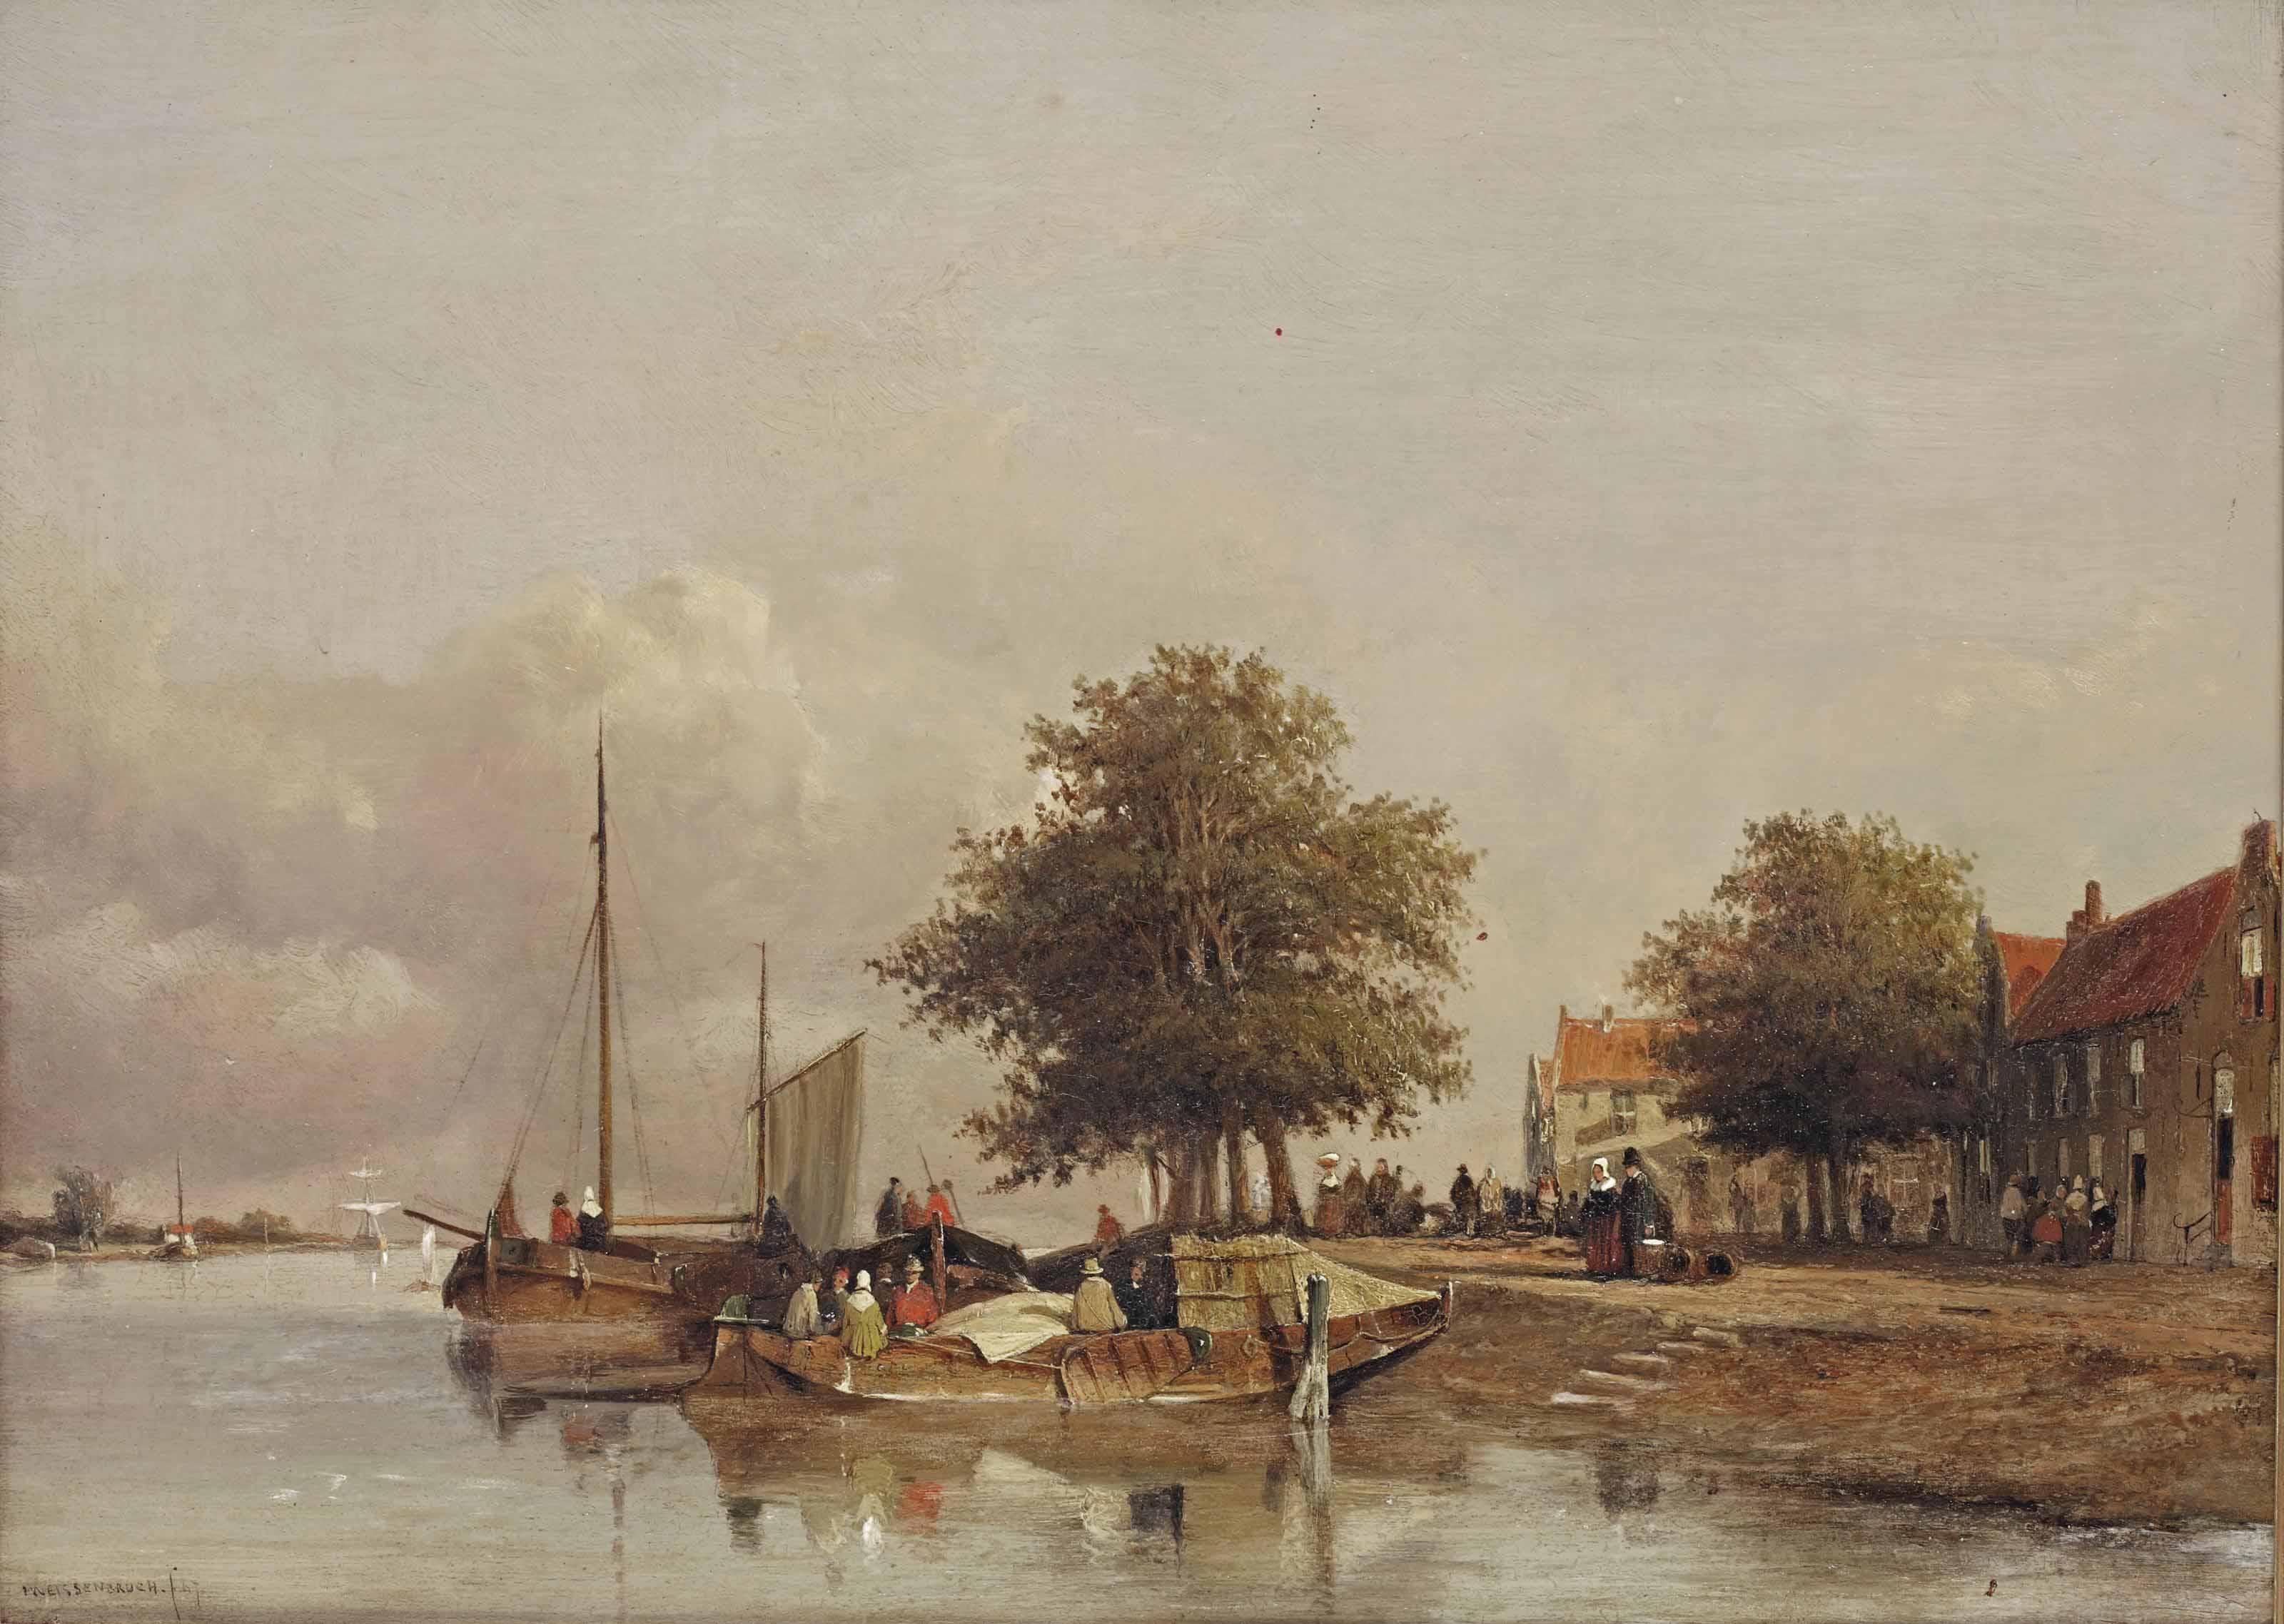 Townfolks on a quay in Wijk bij Duurstede